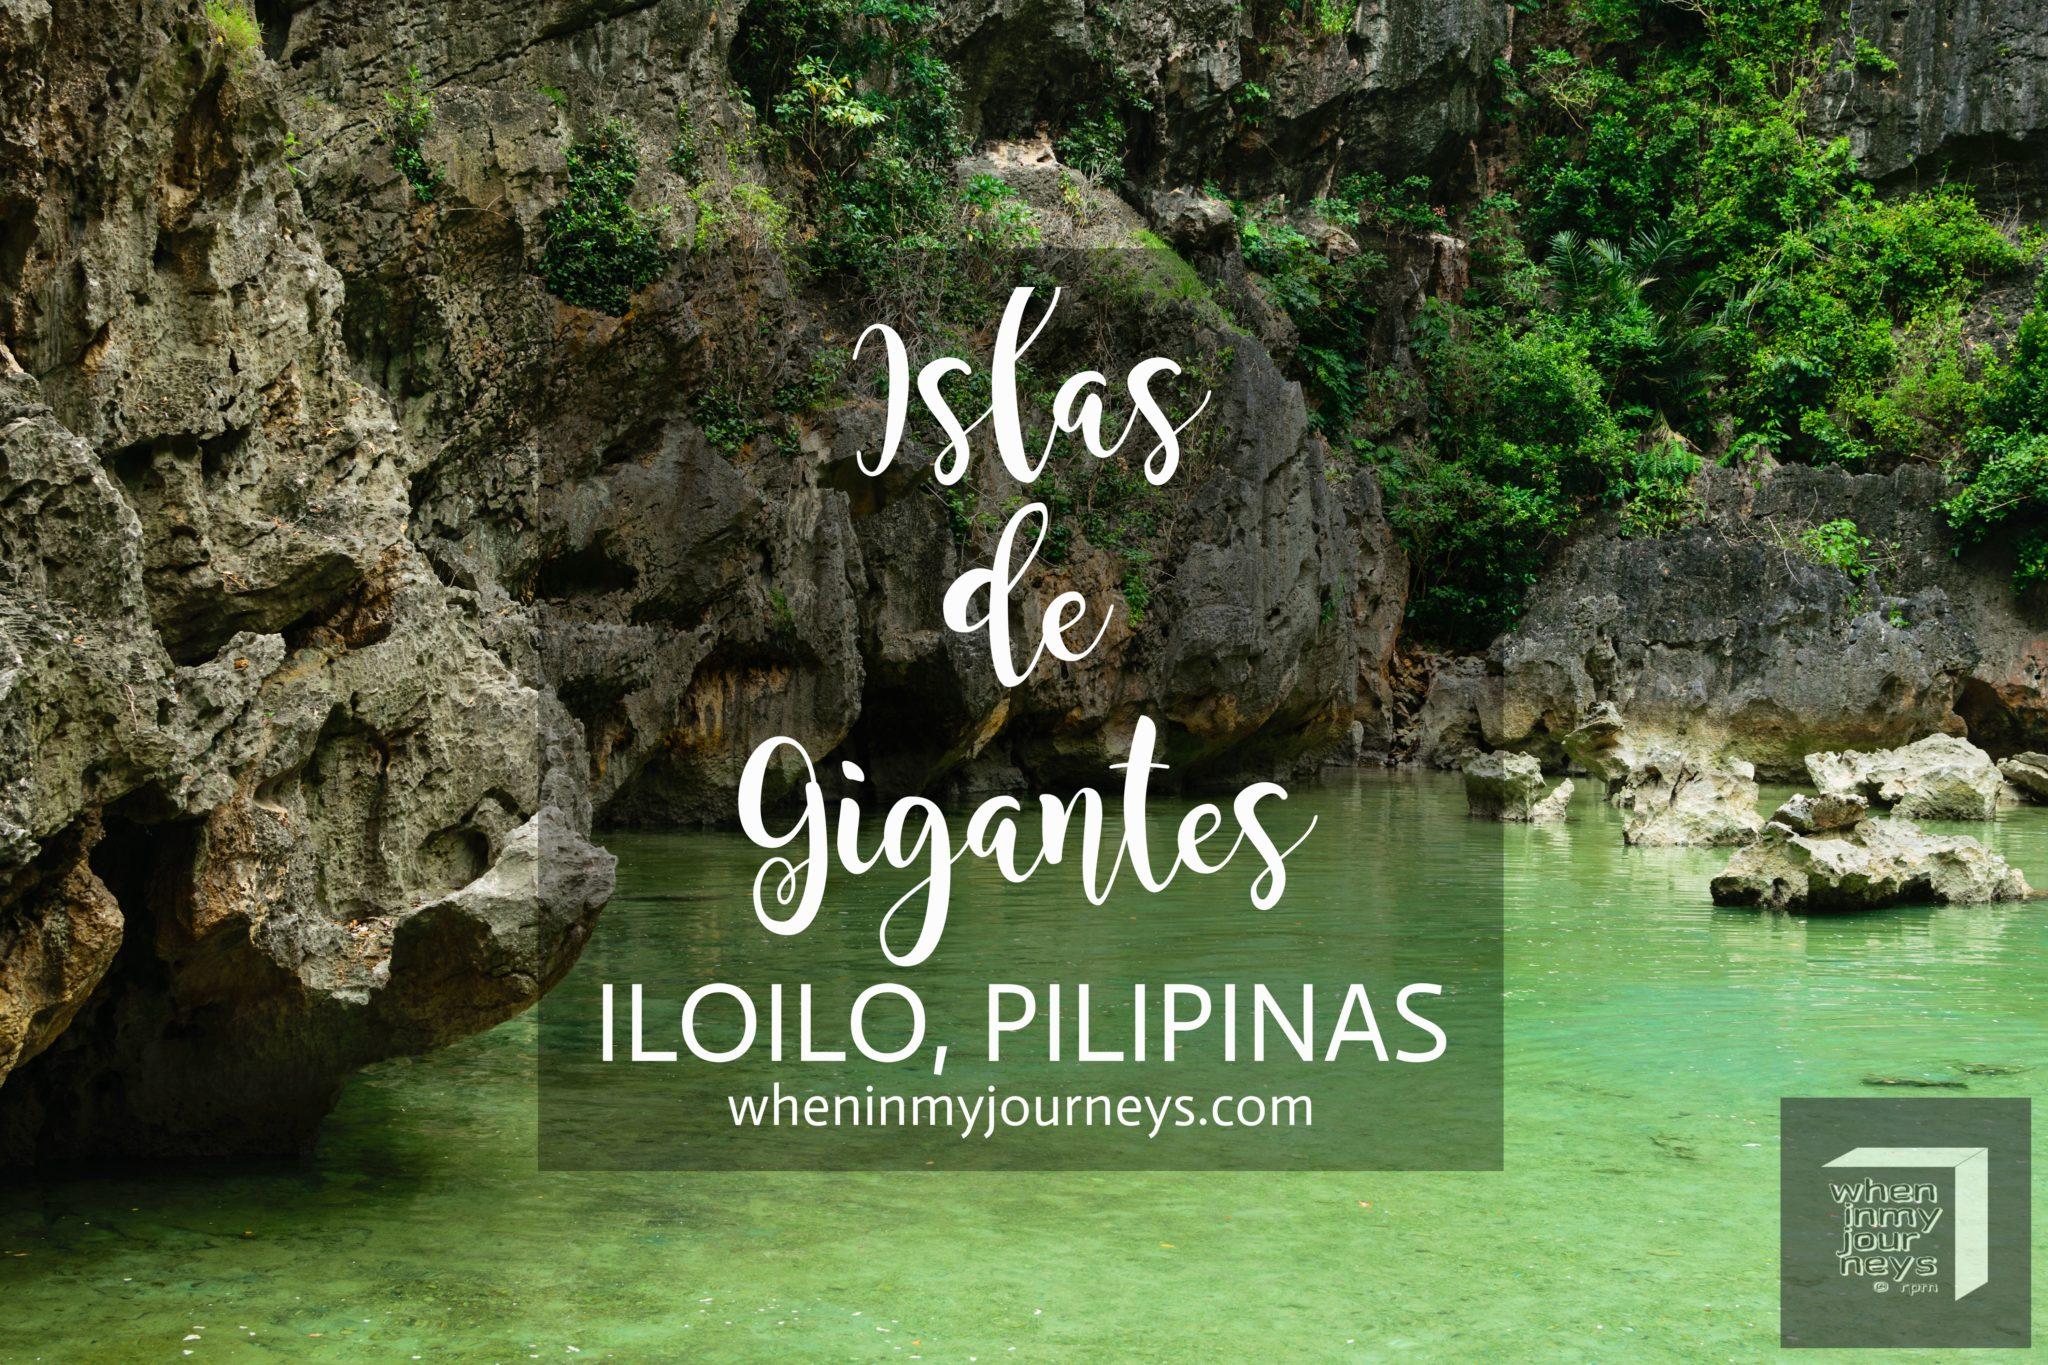 Islas de Gigantes IloIlo Portfolio Featured Image